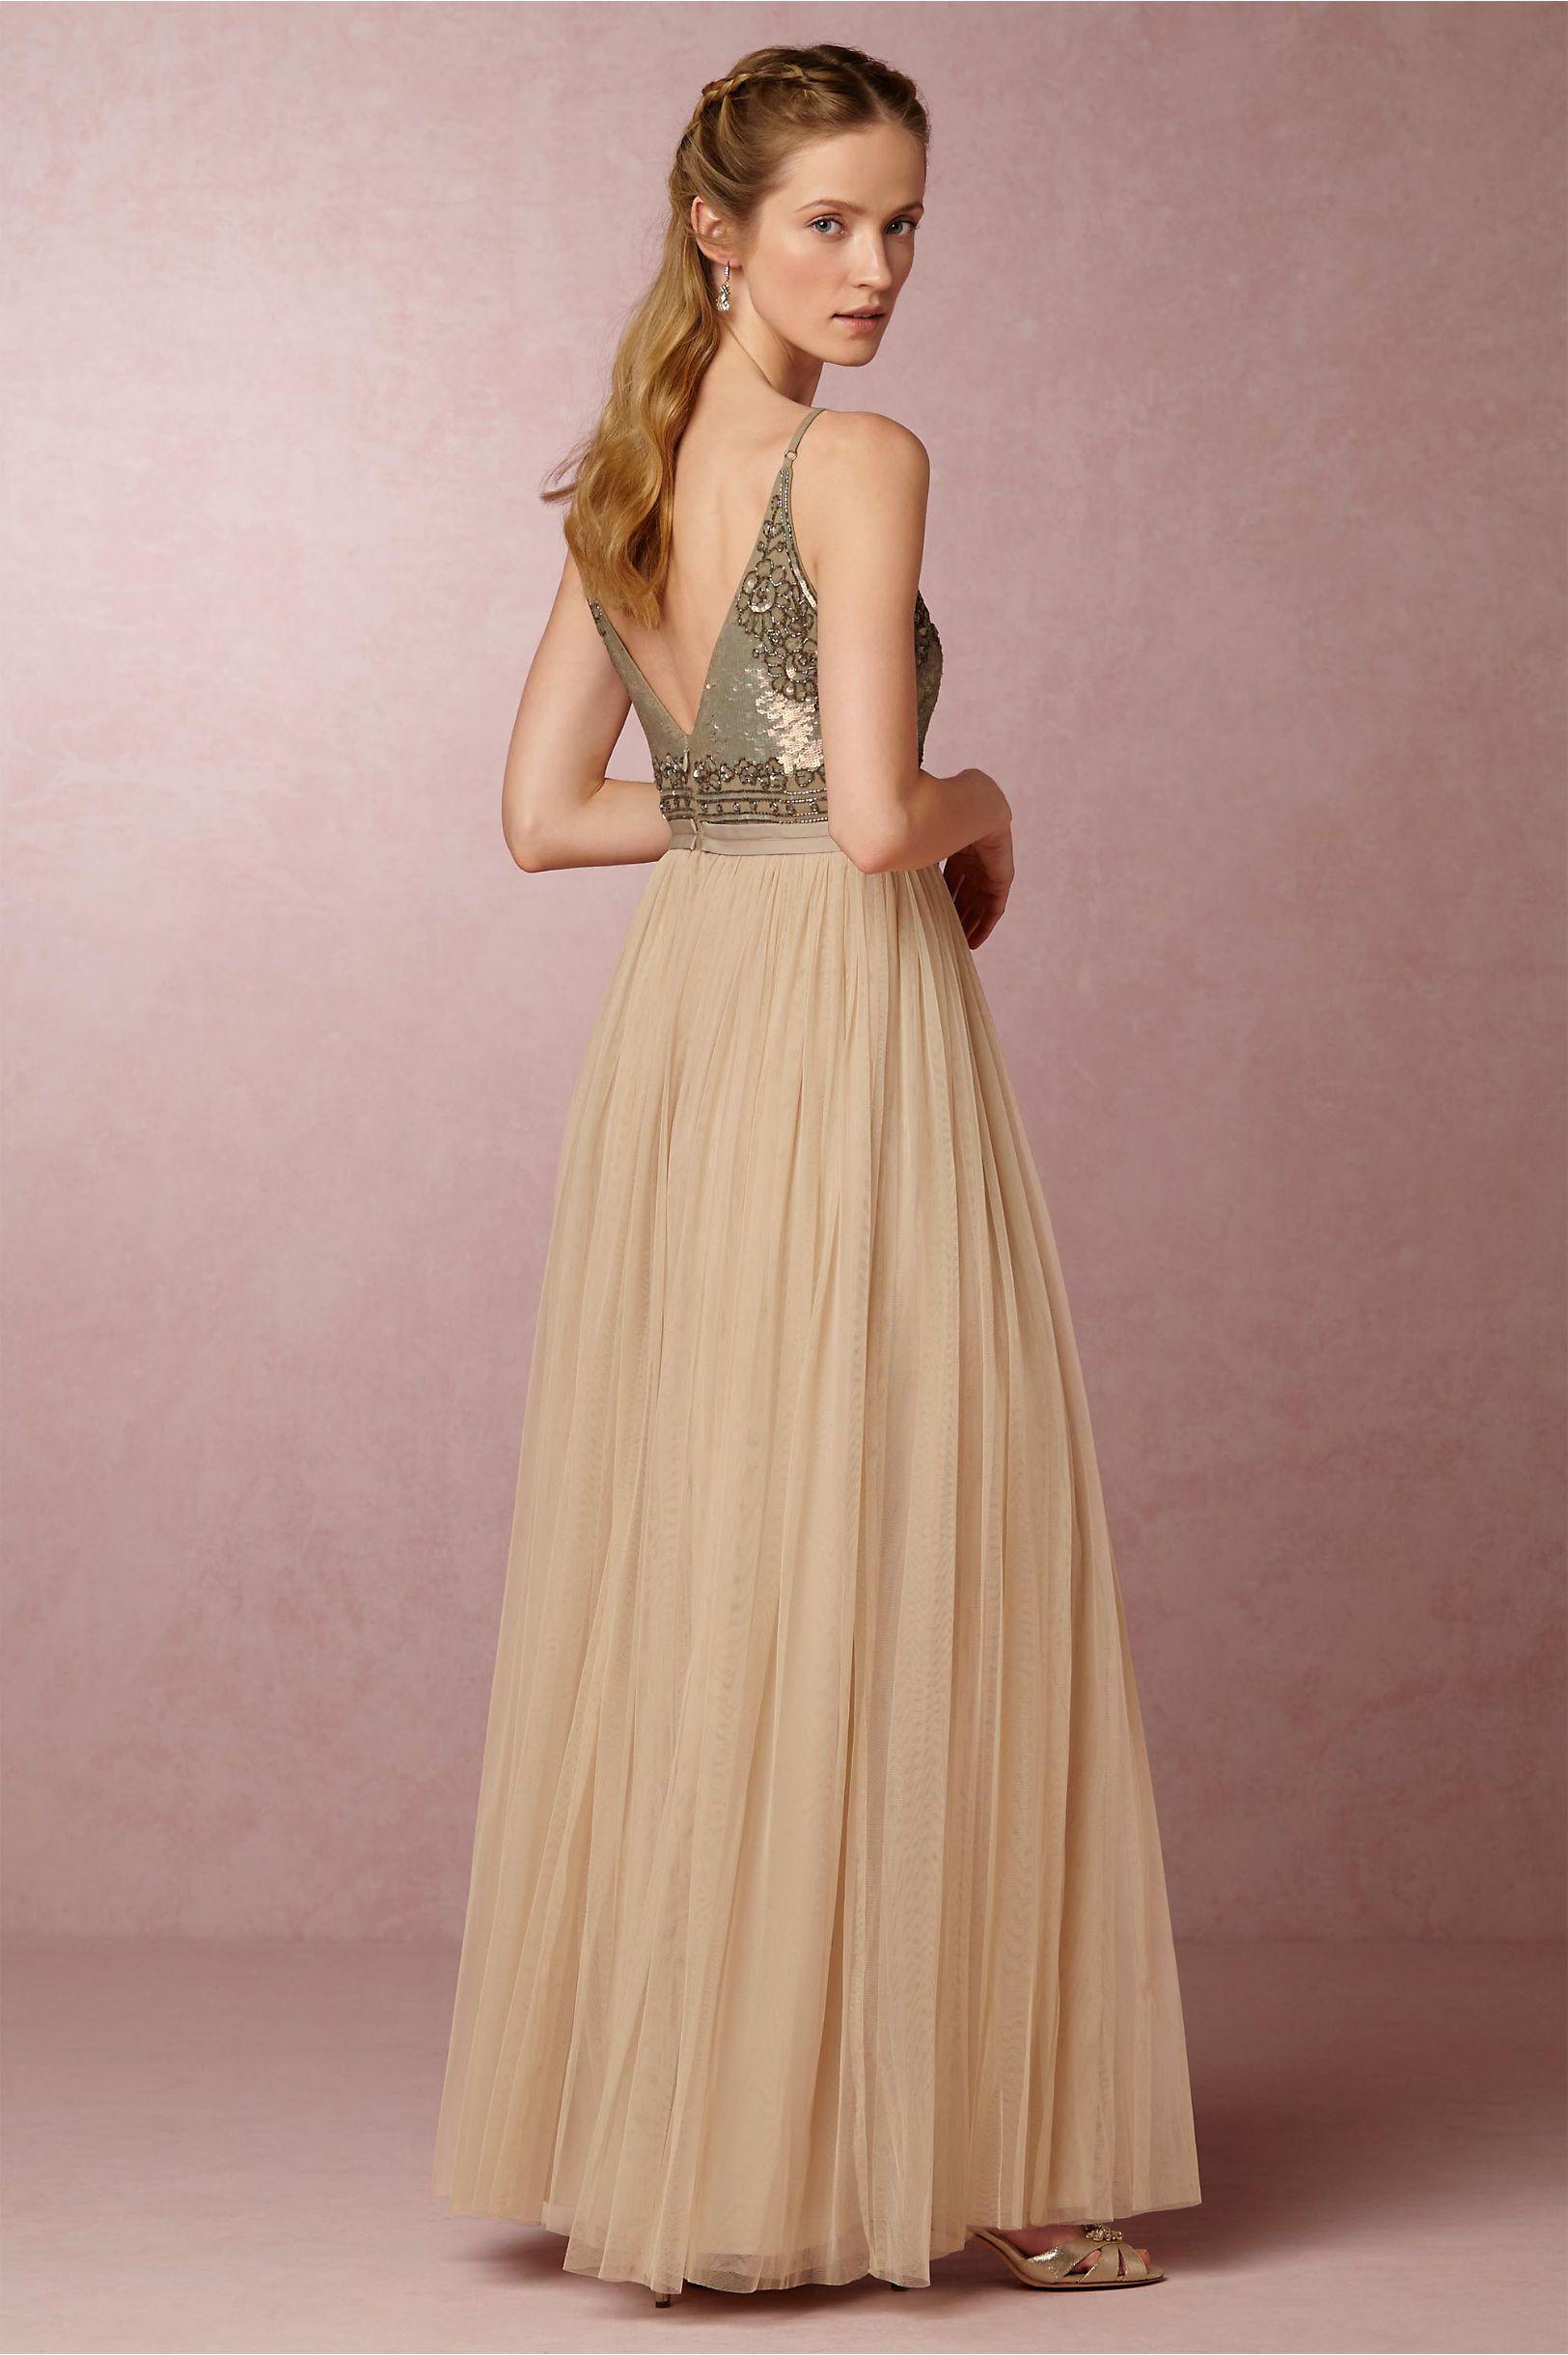 6ce4810243 BHLDN Brisa Dress in Beach & Honeymoon at BHLDN   Dresses.   Bride ...